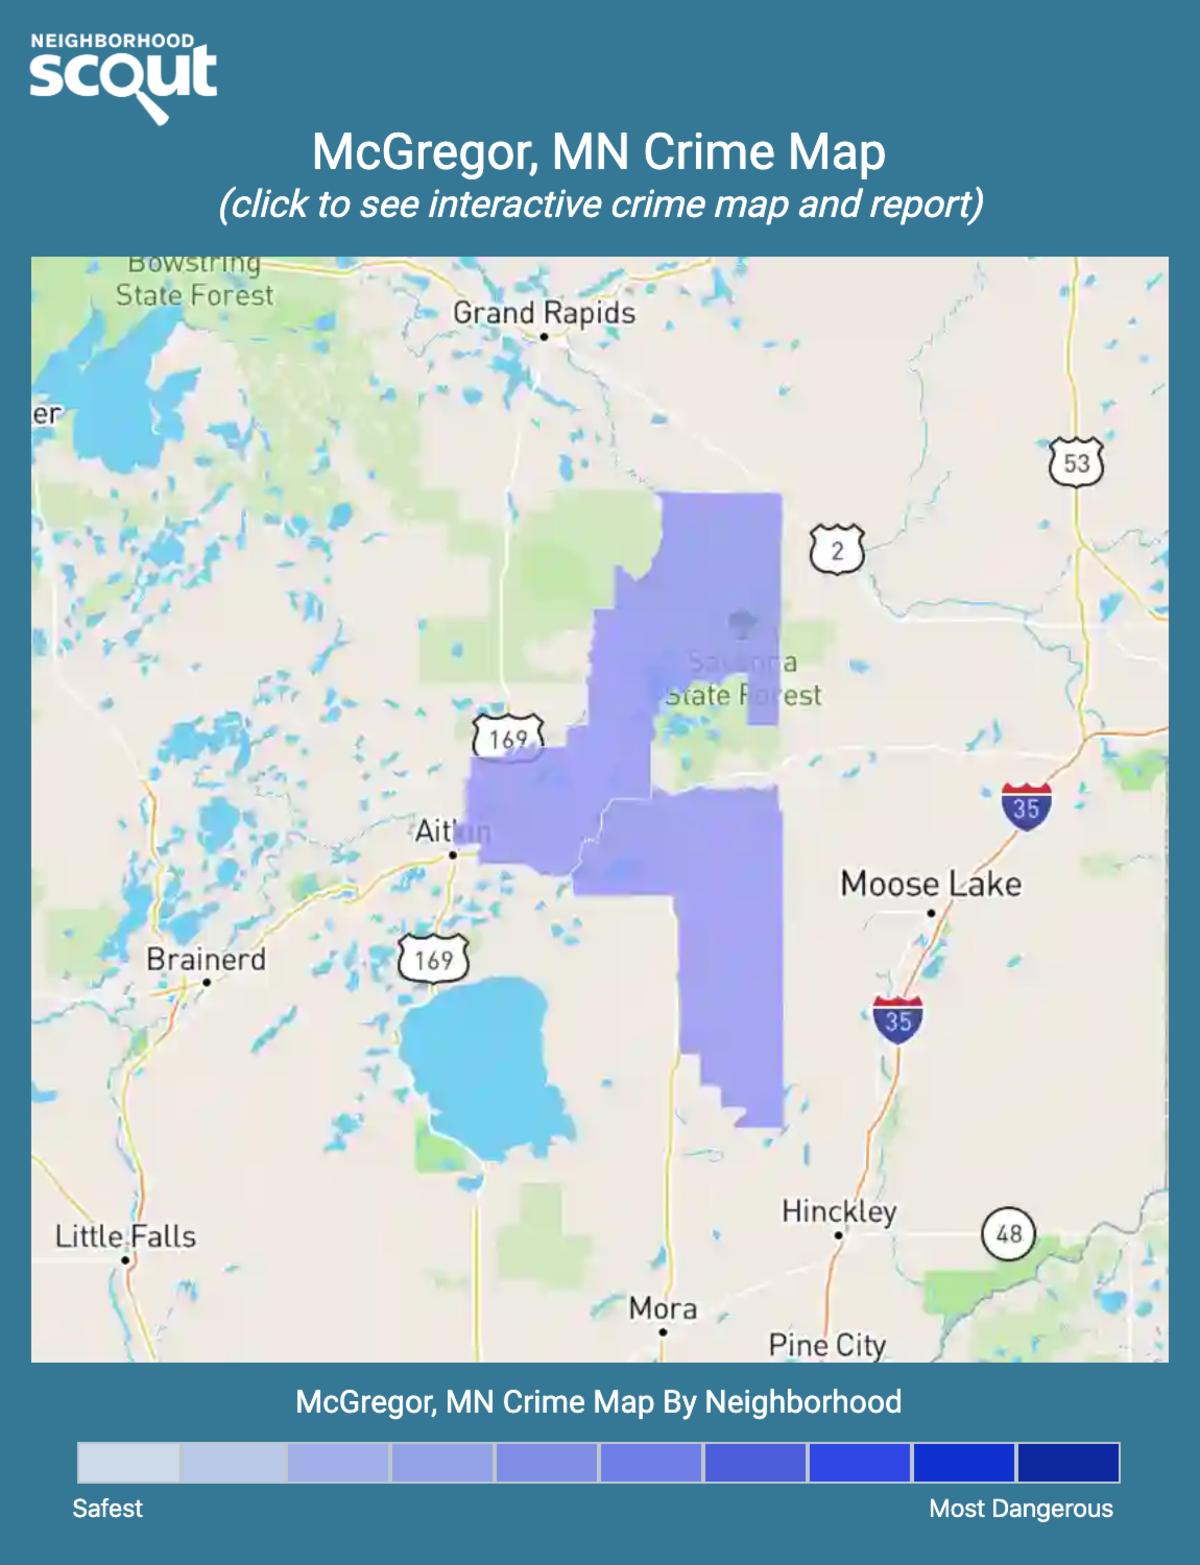 McGregor, Minnesota crime map